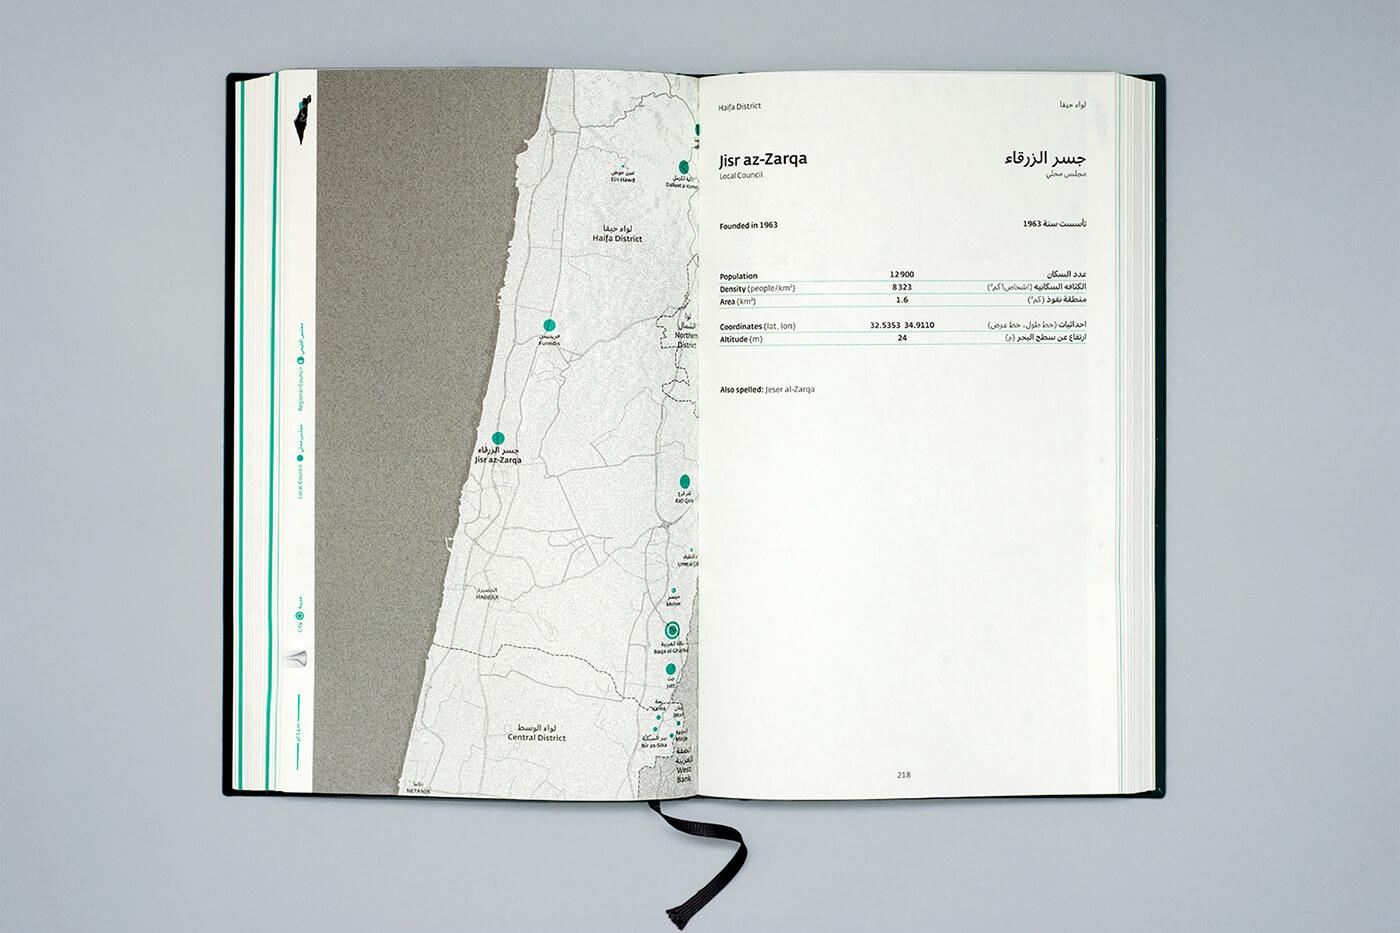 Atlas of Palestinian Communities in Israel • ISBN 978-3-033